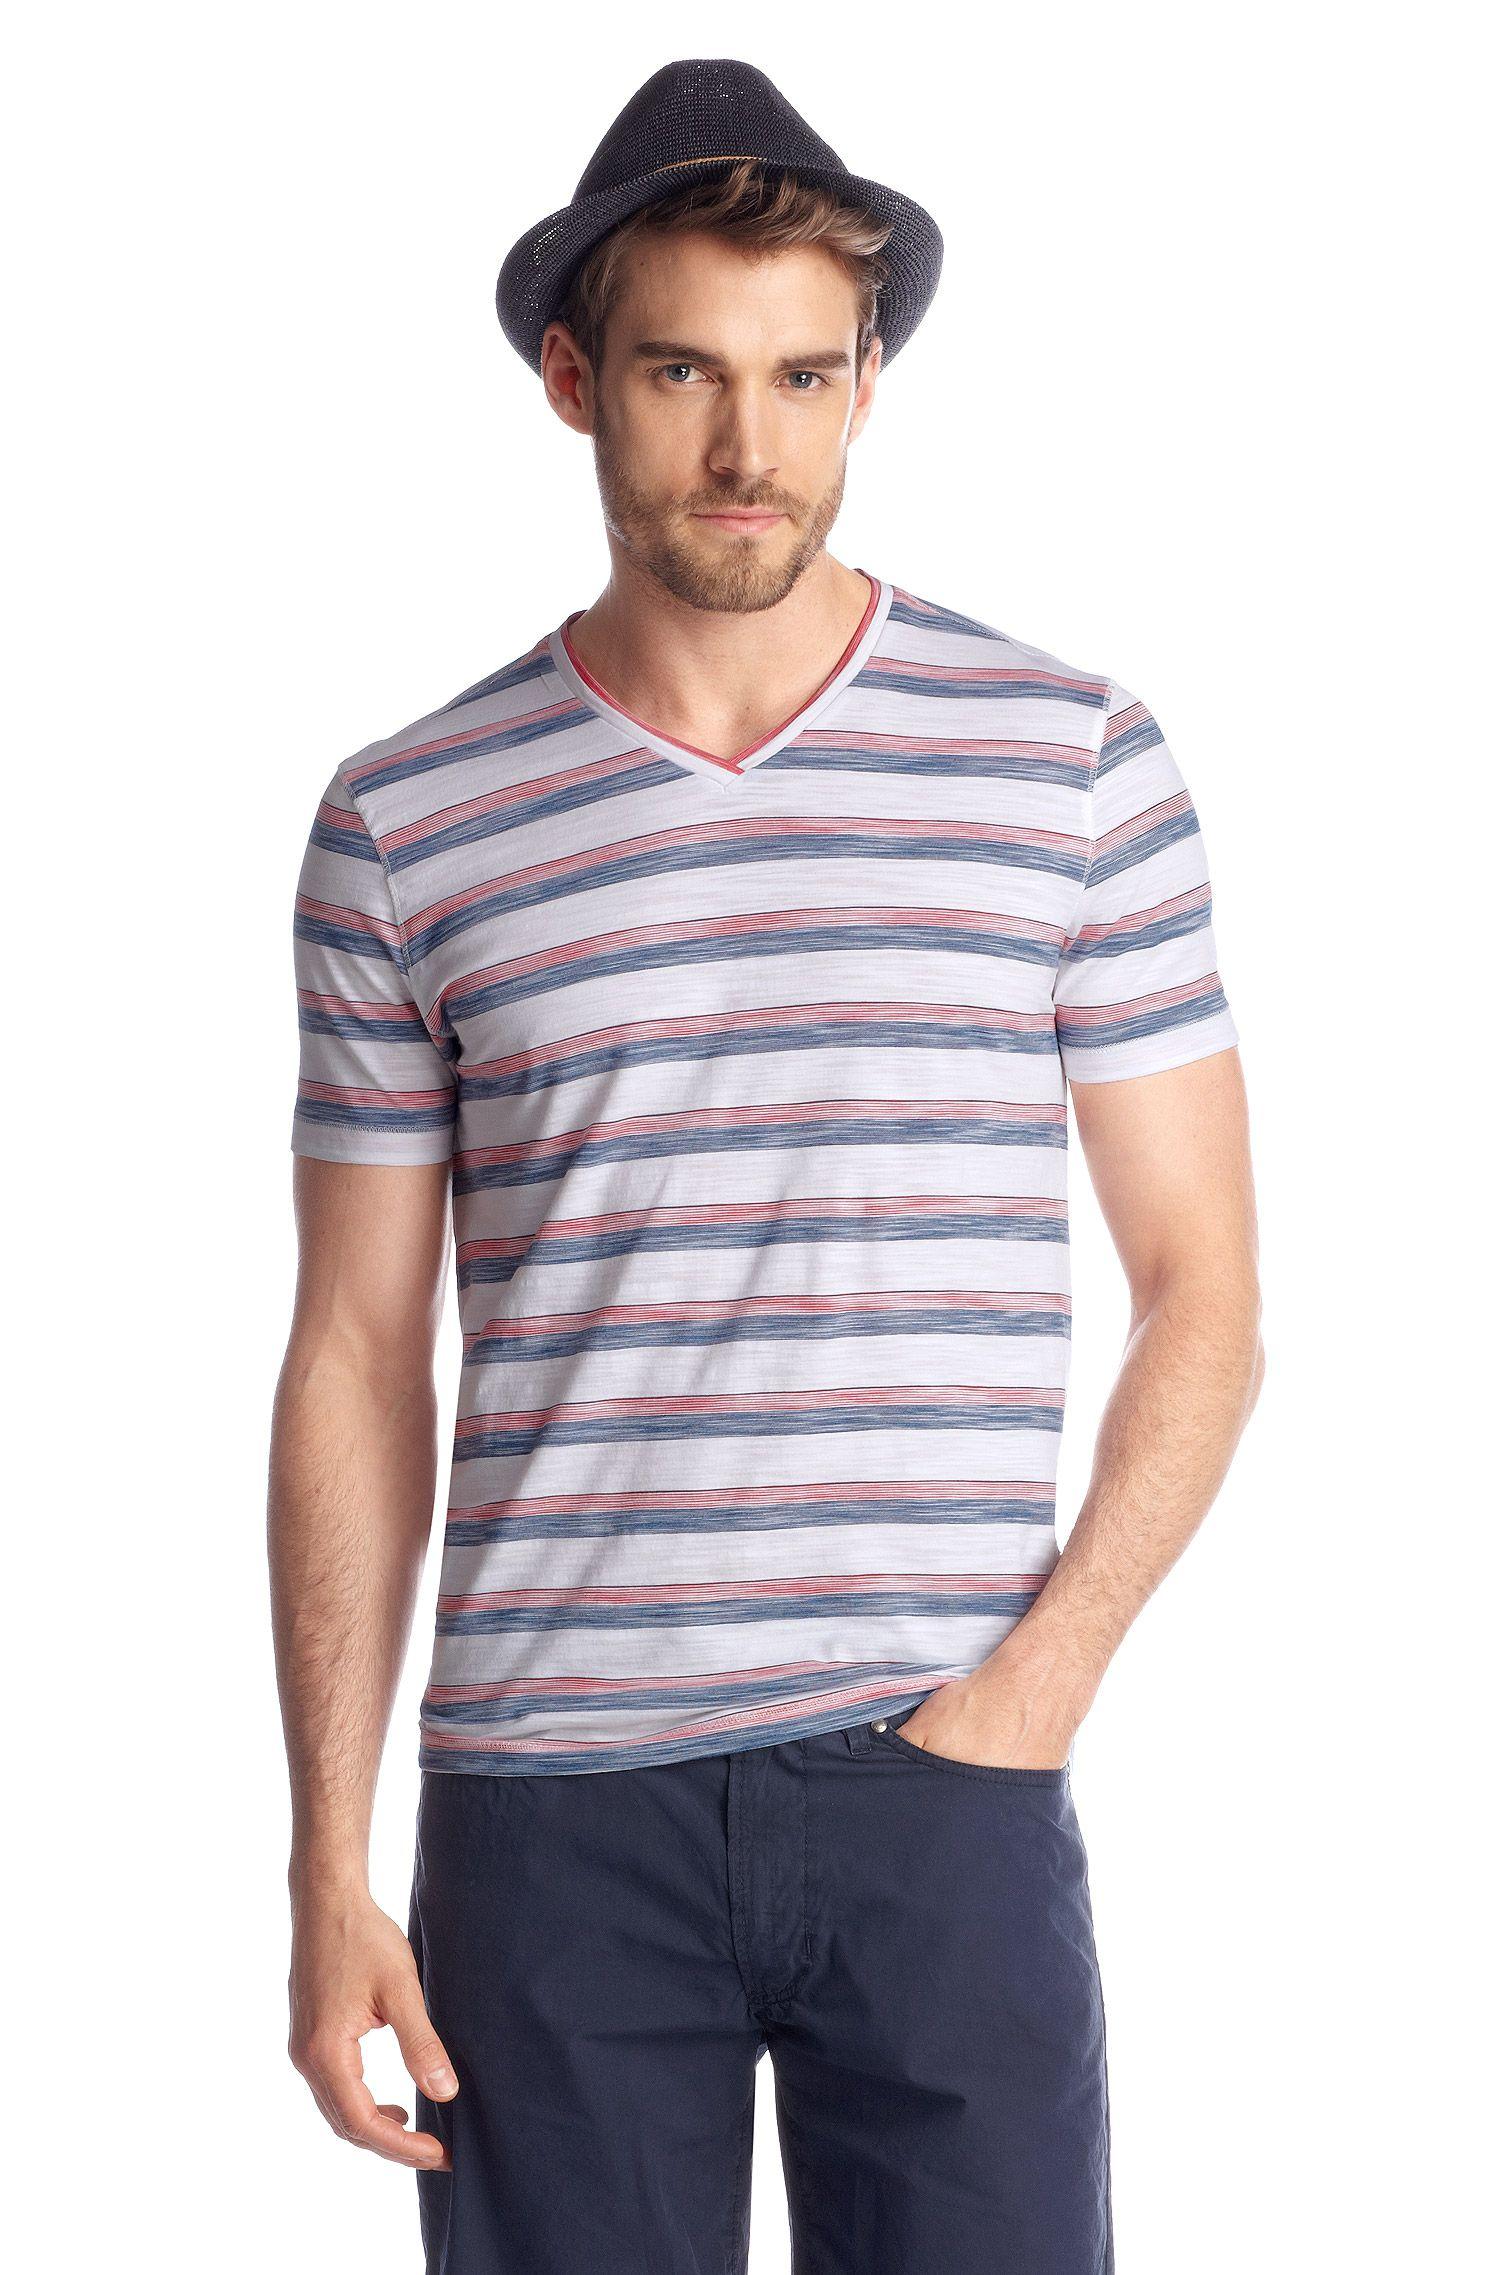 T-shirt à encolure en V, Eraldo 54